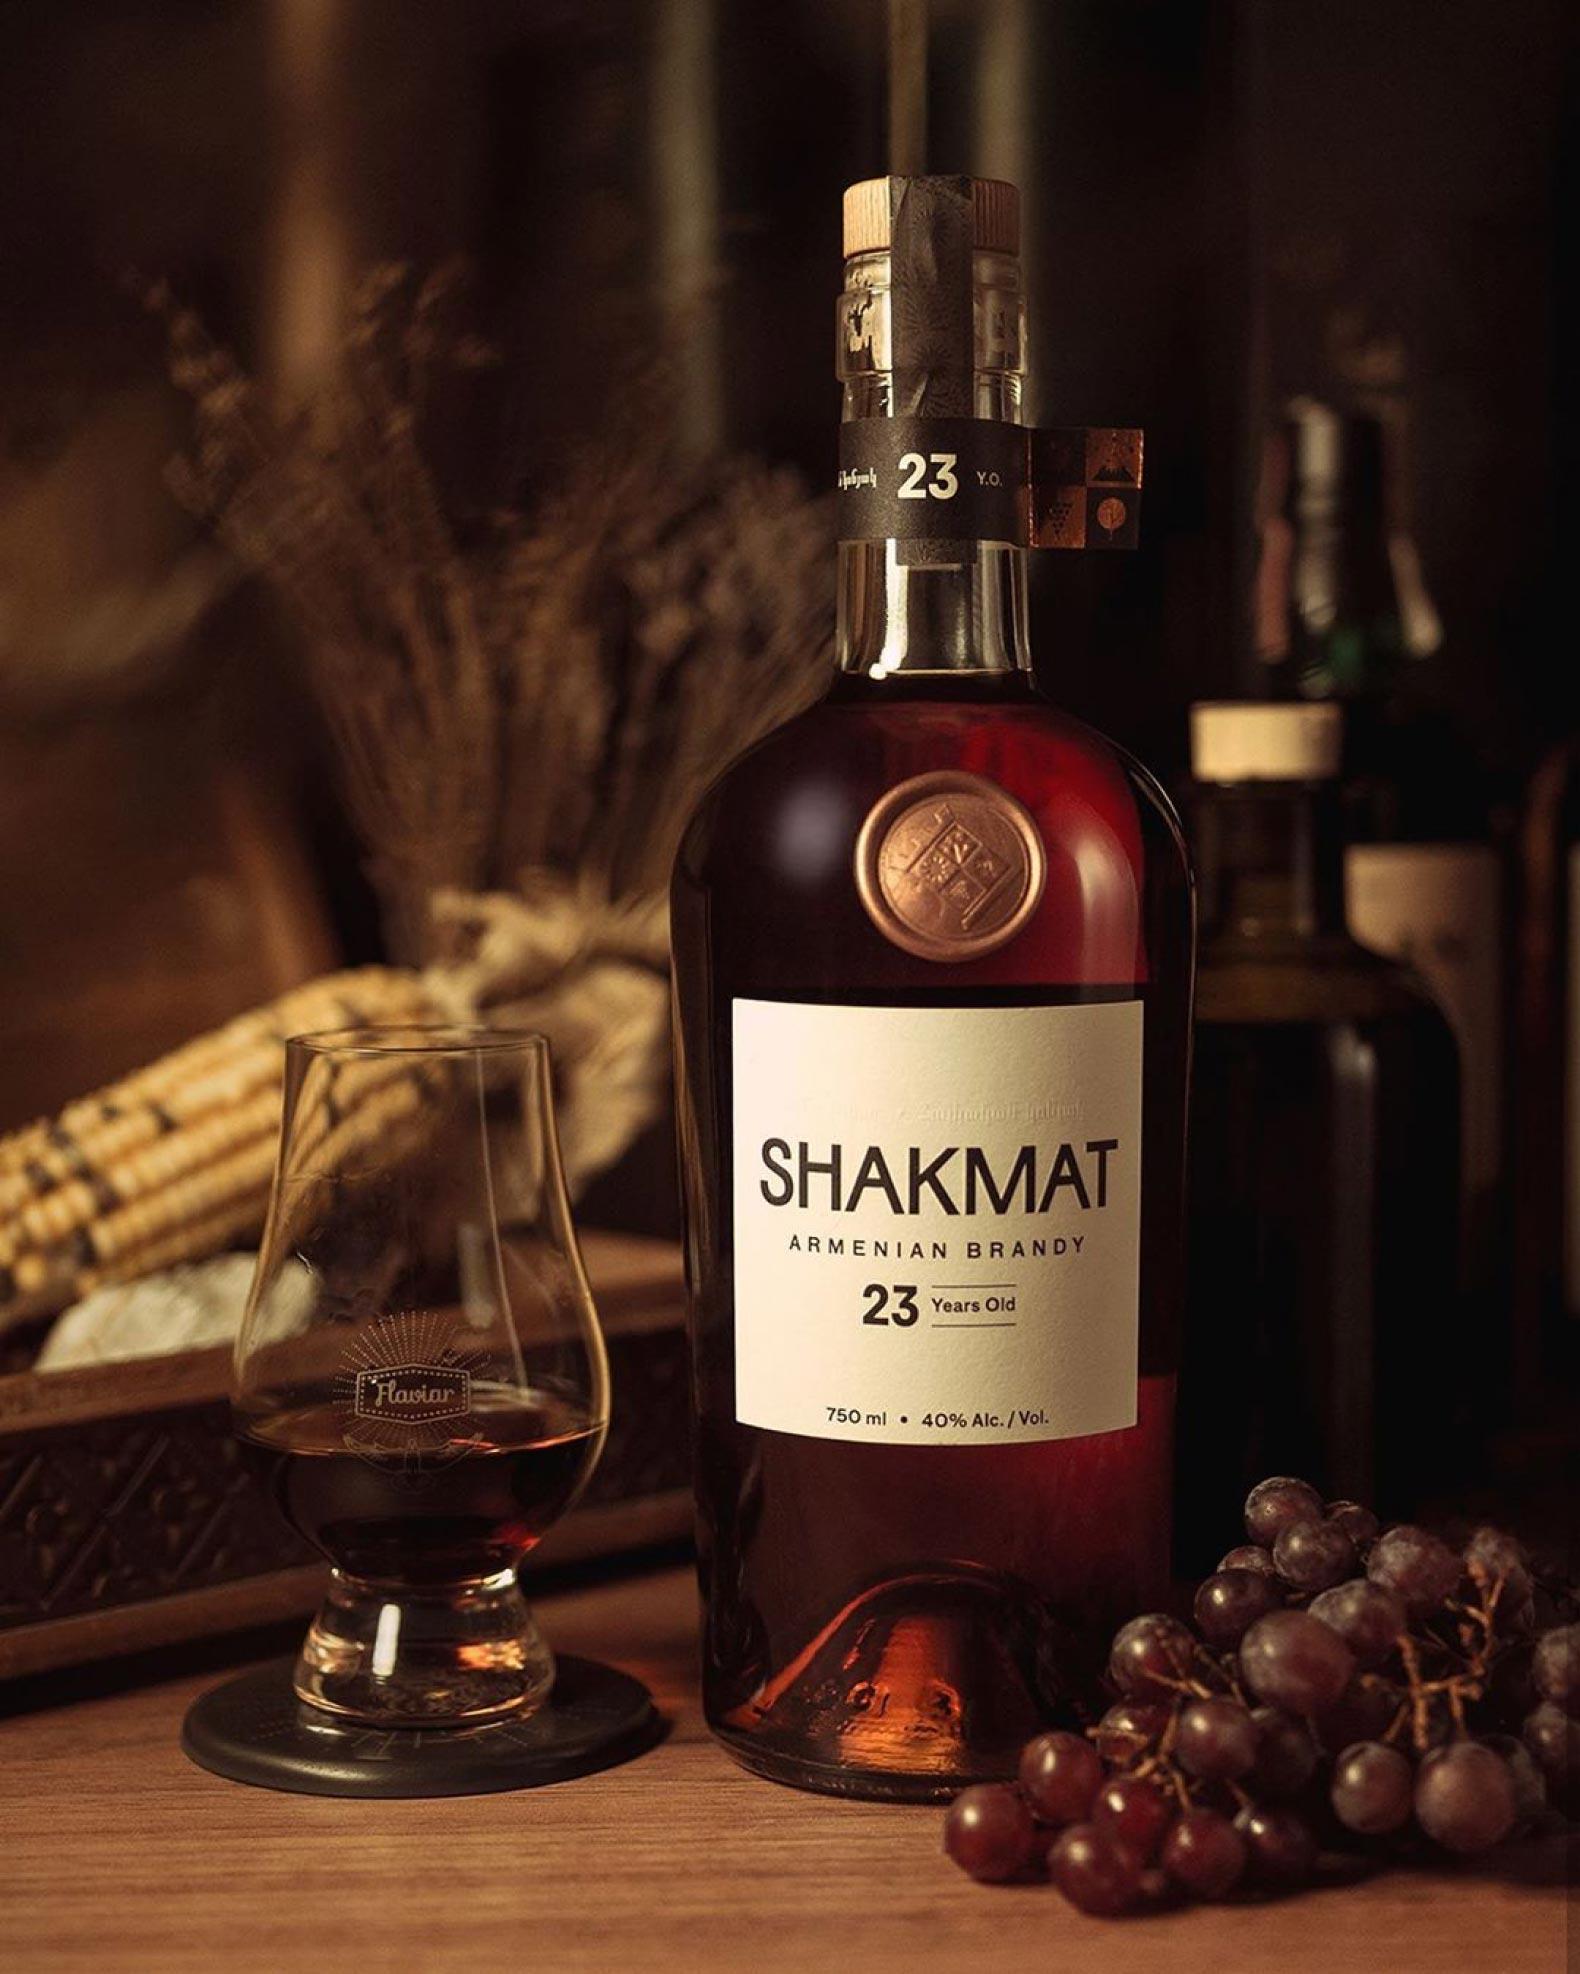 Shakmat